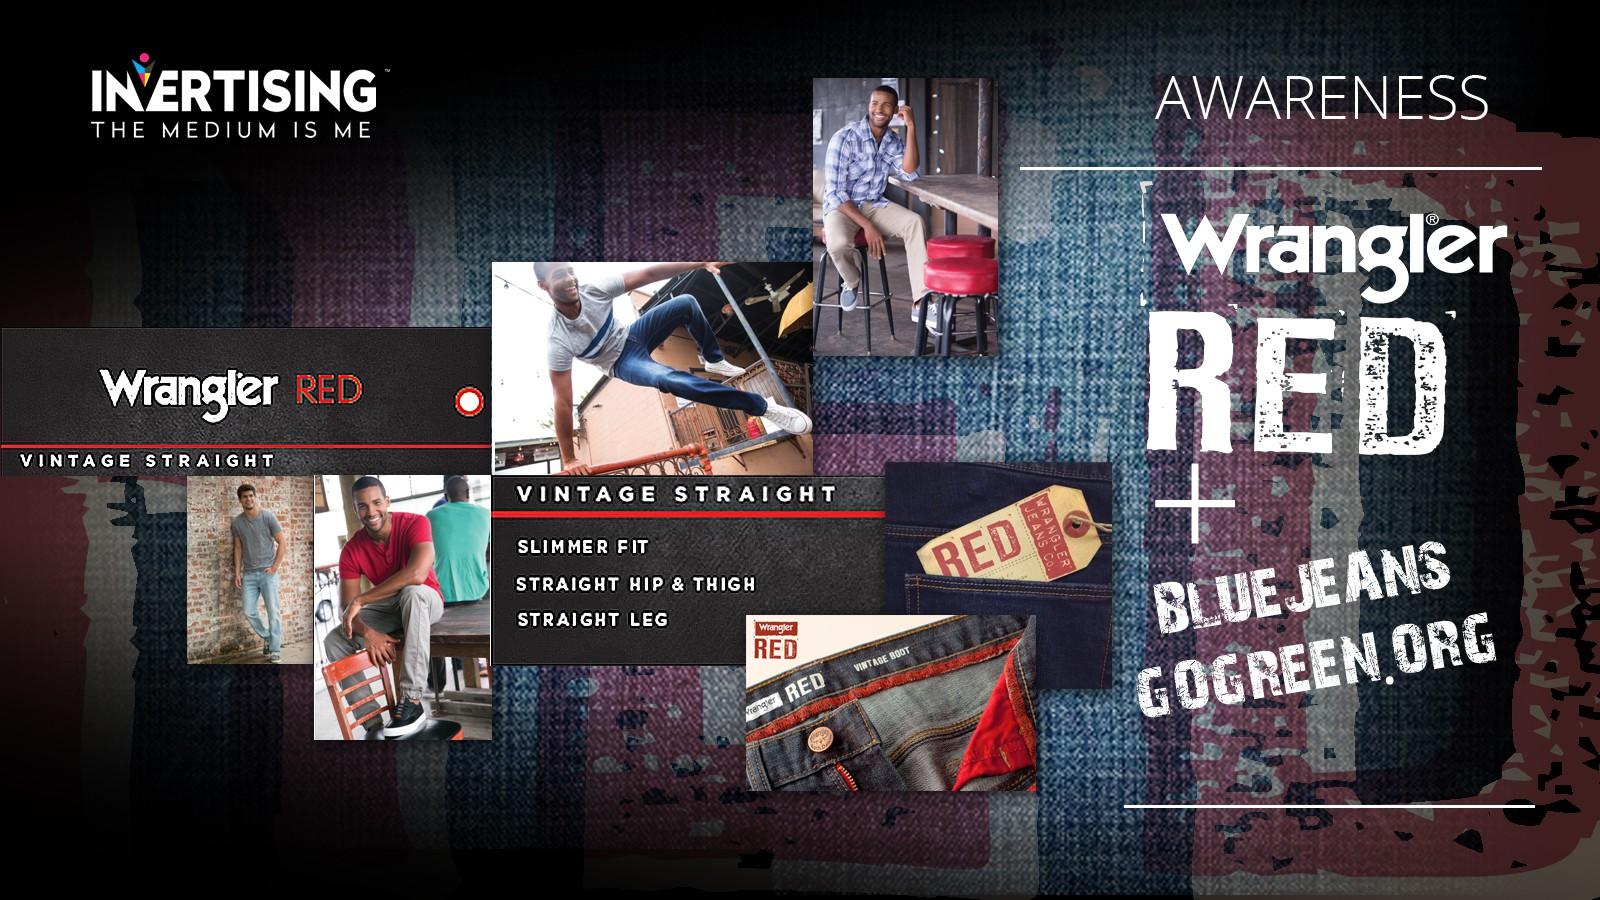 Wrangler Red  + Bluejeansgogreen campaign